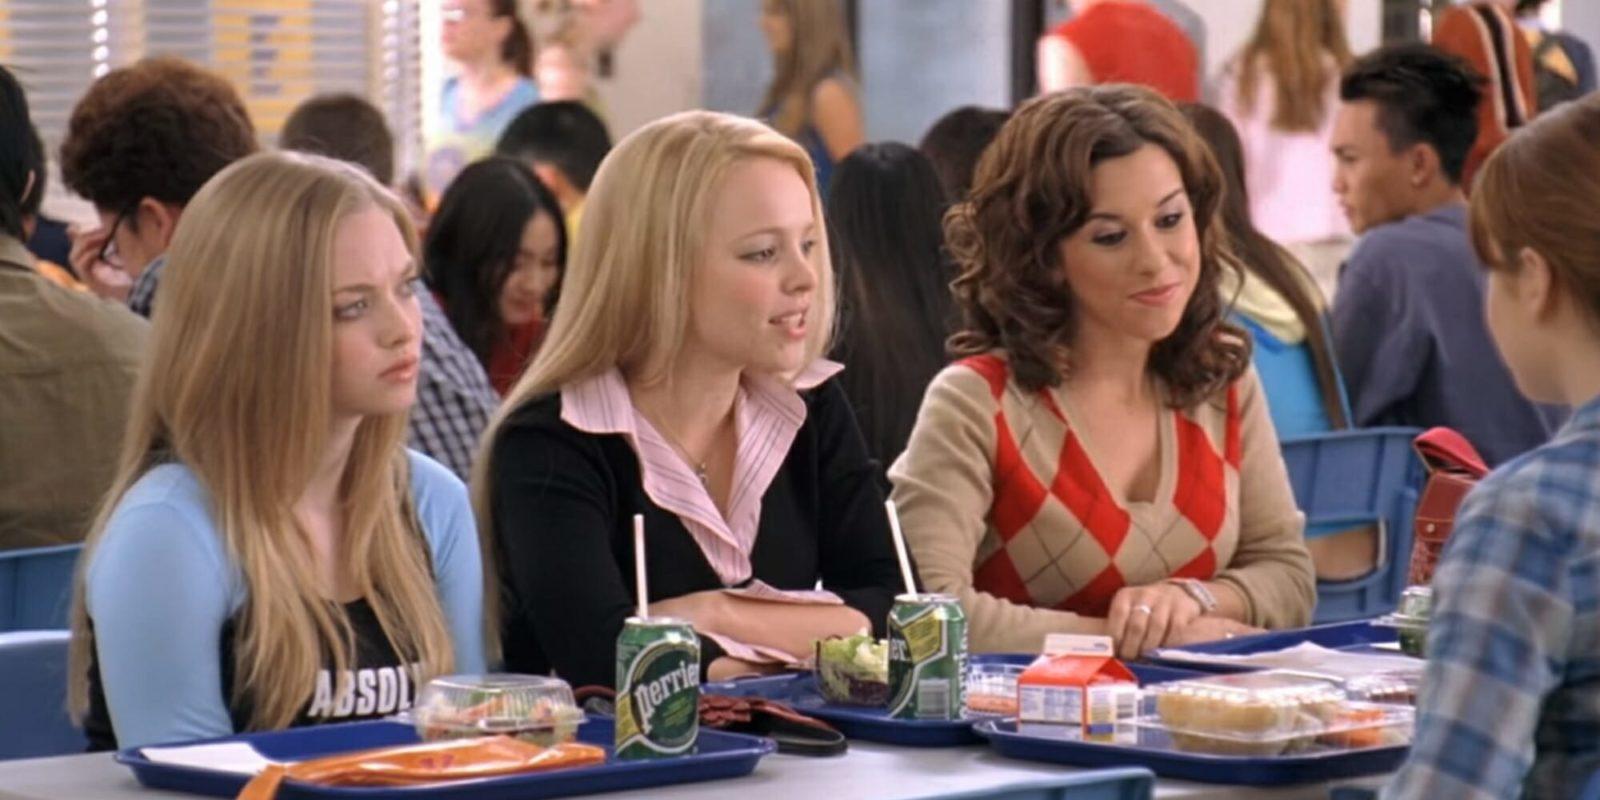 Karen Smith (Amanda Seyfried), Regina George (Rachel McAdams) e Gretchen Wieners (Lacey Chabert) em Meninas Malvadas.